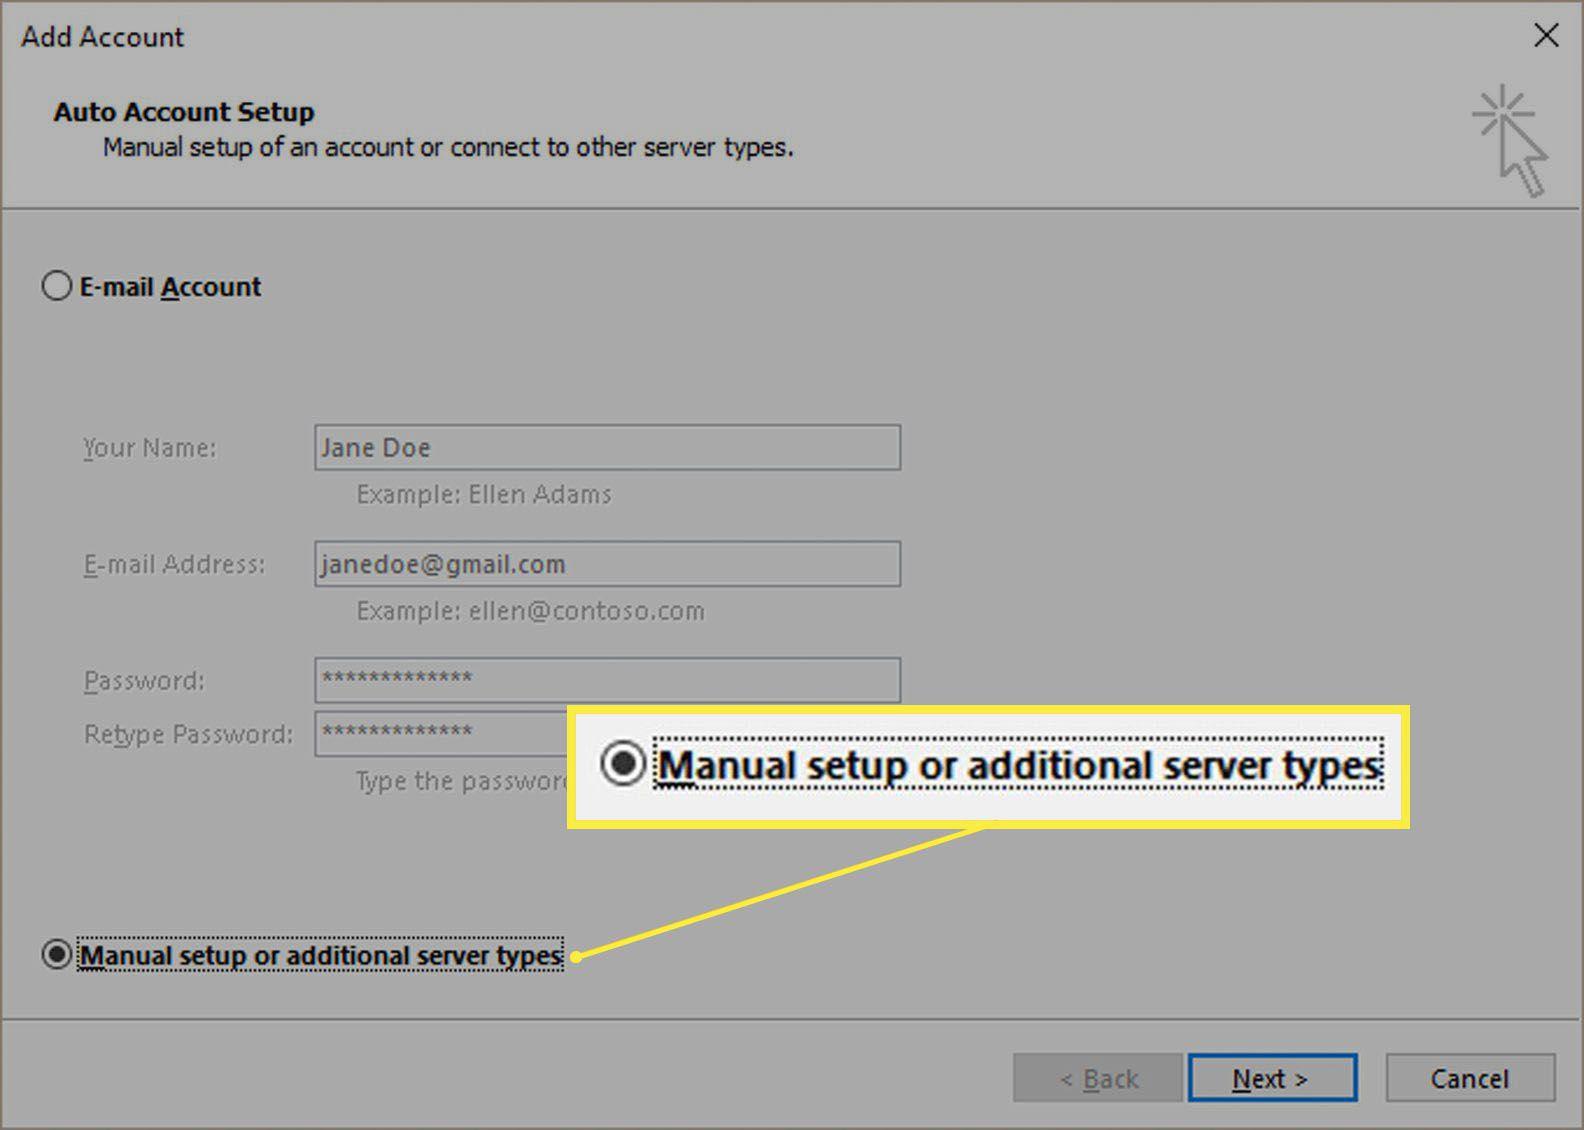 Manual setup of additional server types.